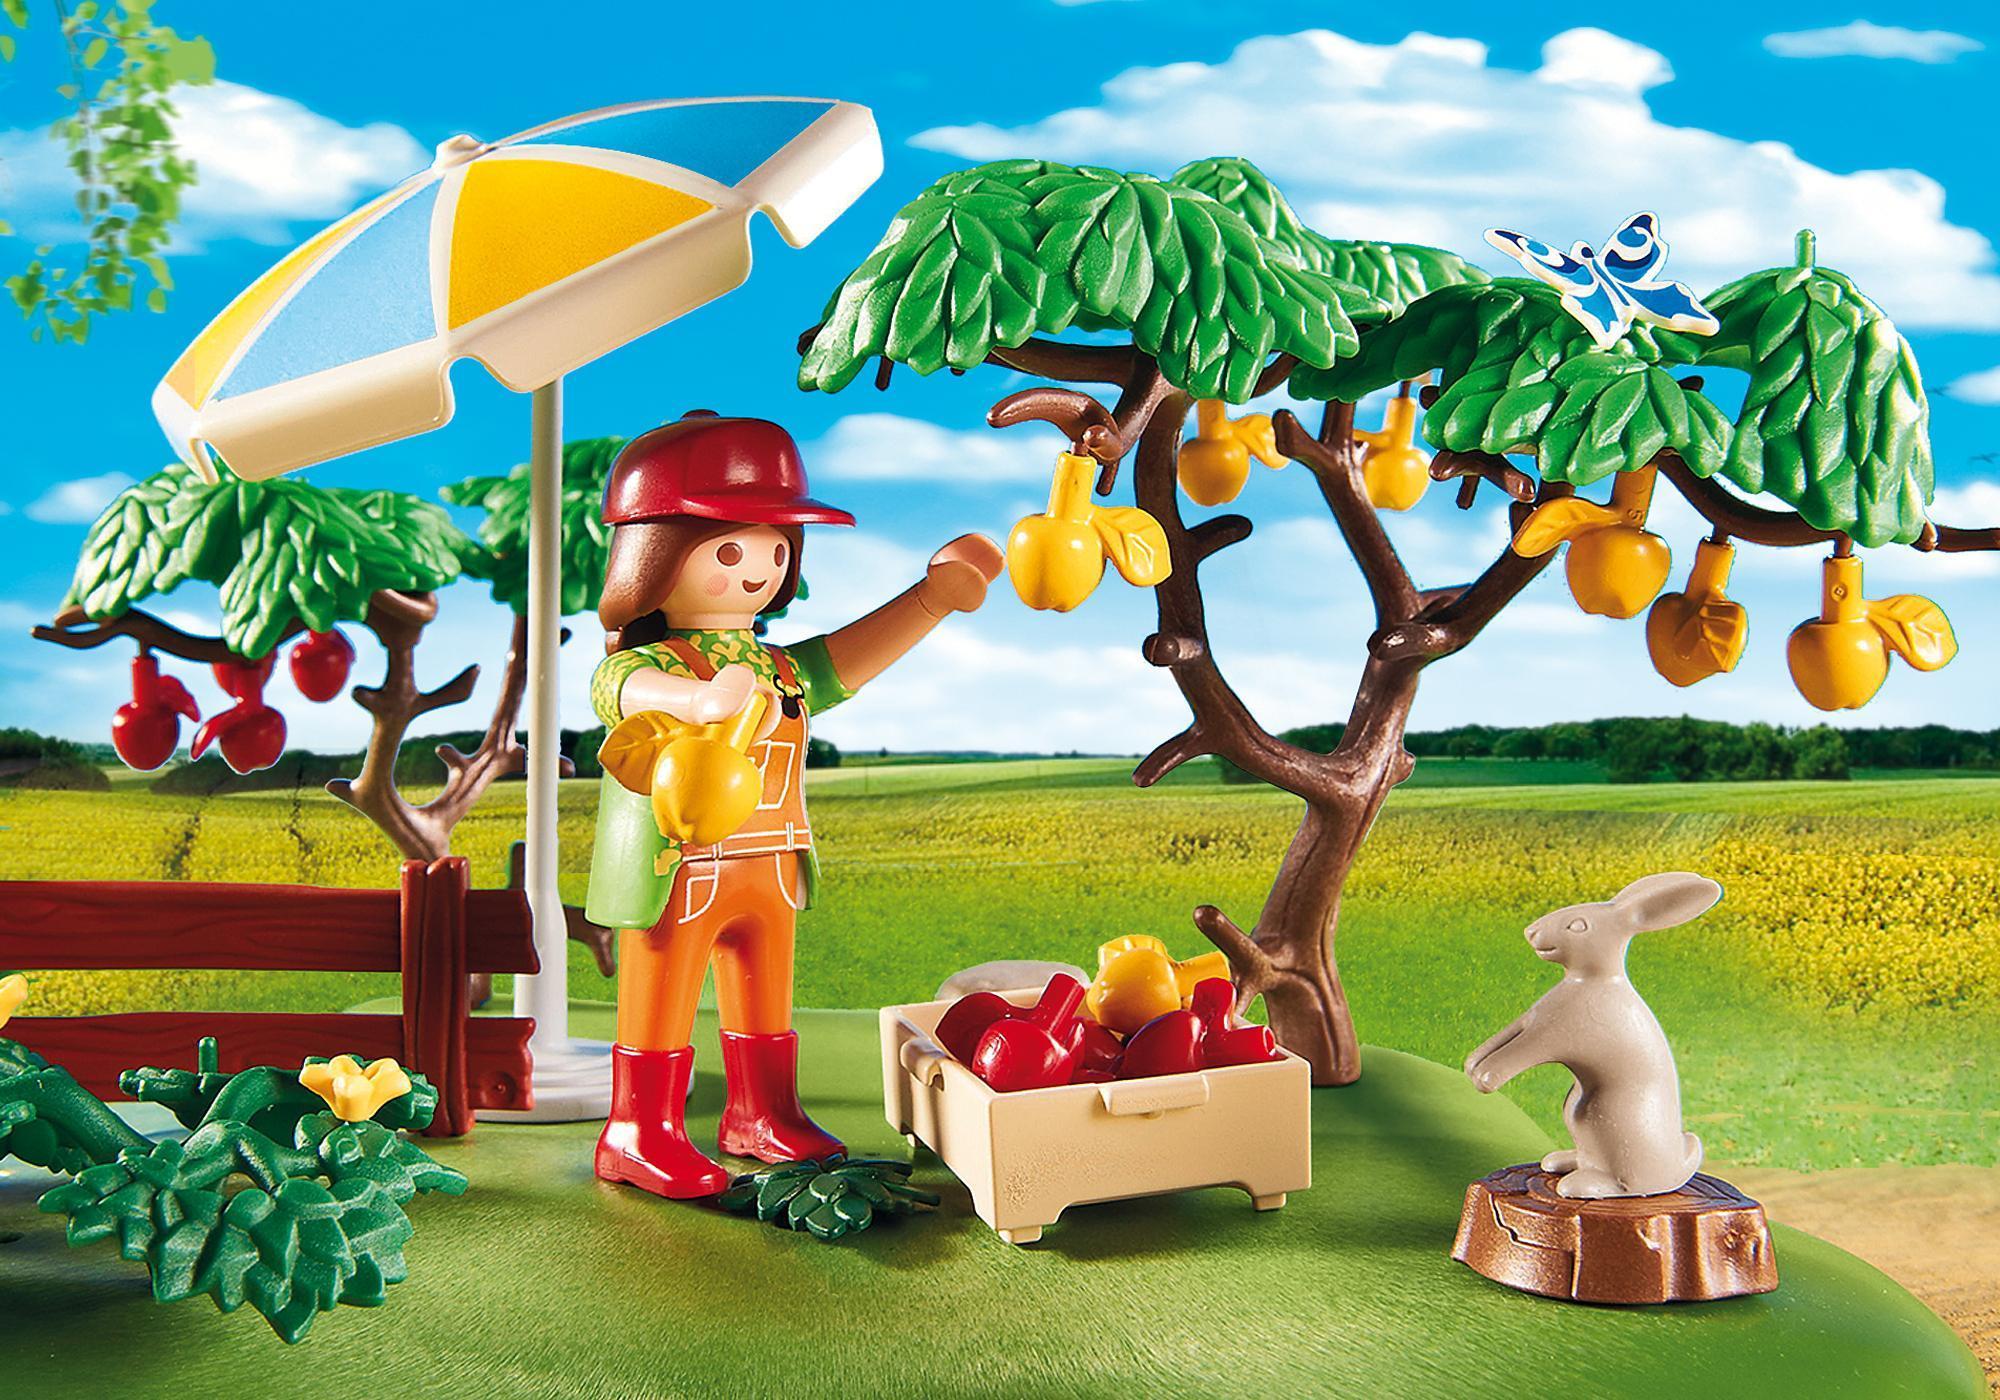 http://media.playmobil.com/i/playmobil/6870_product_extra1